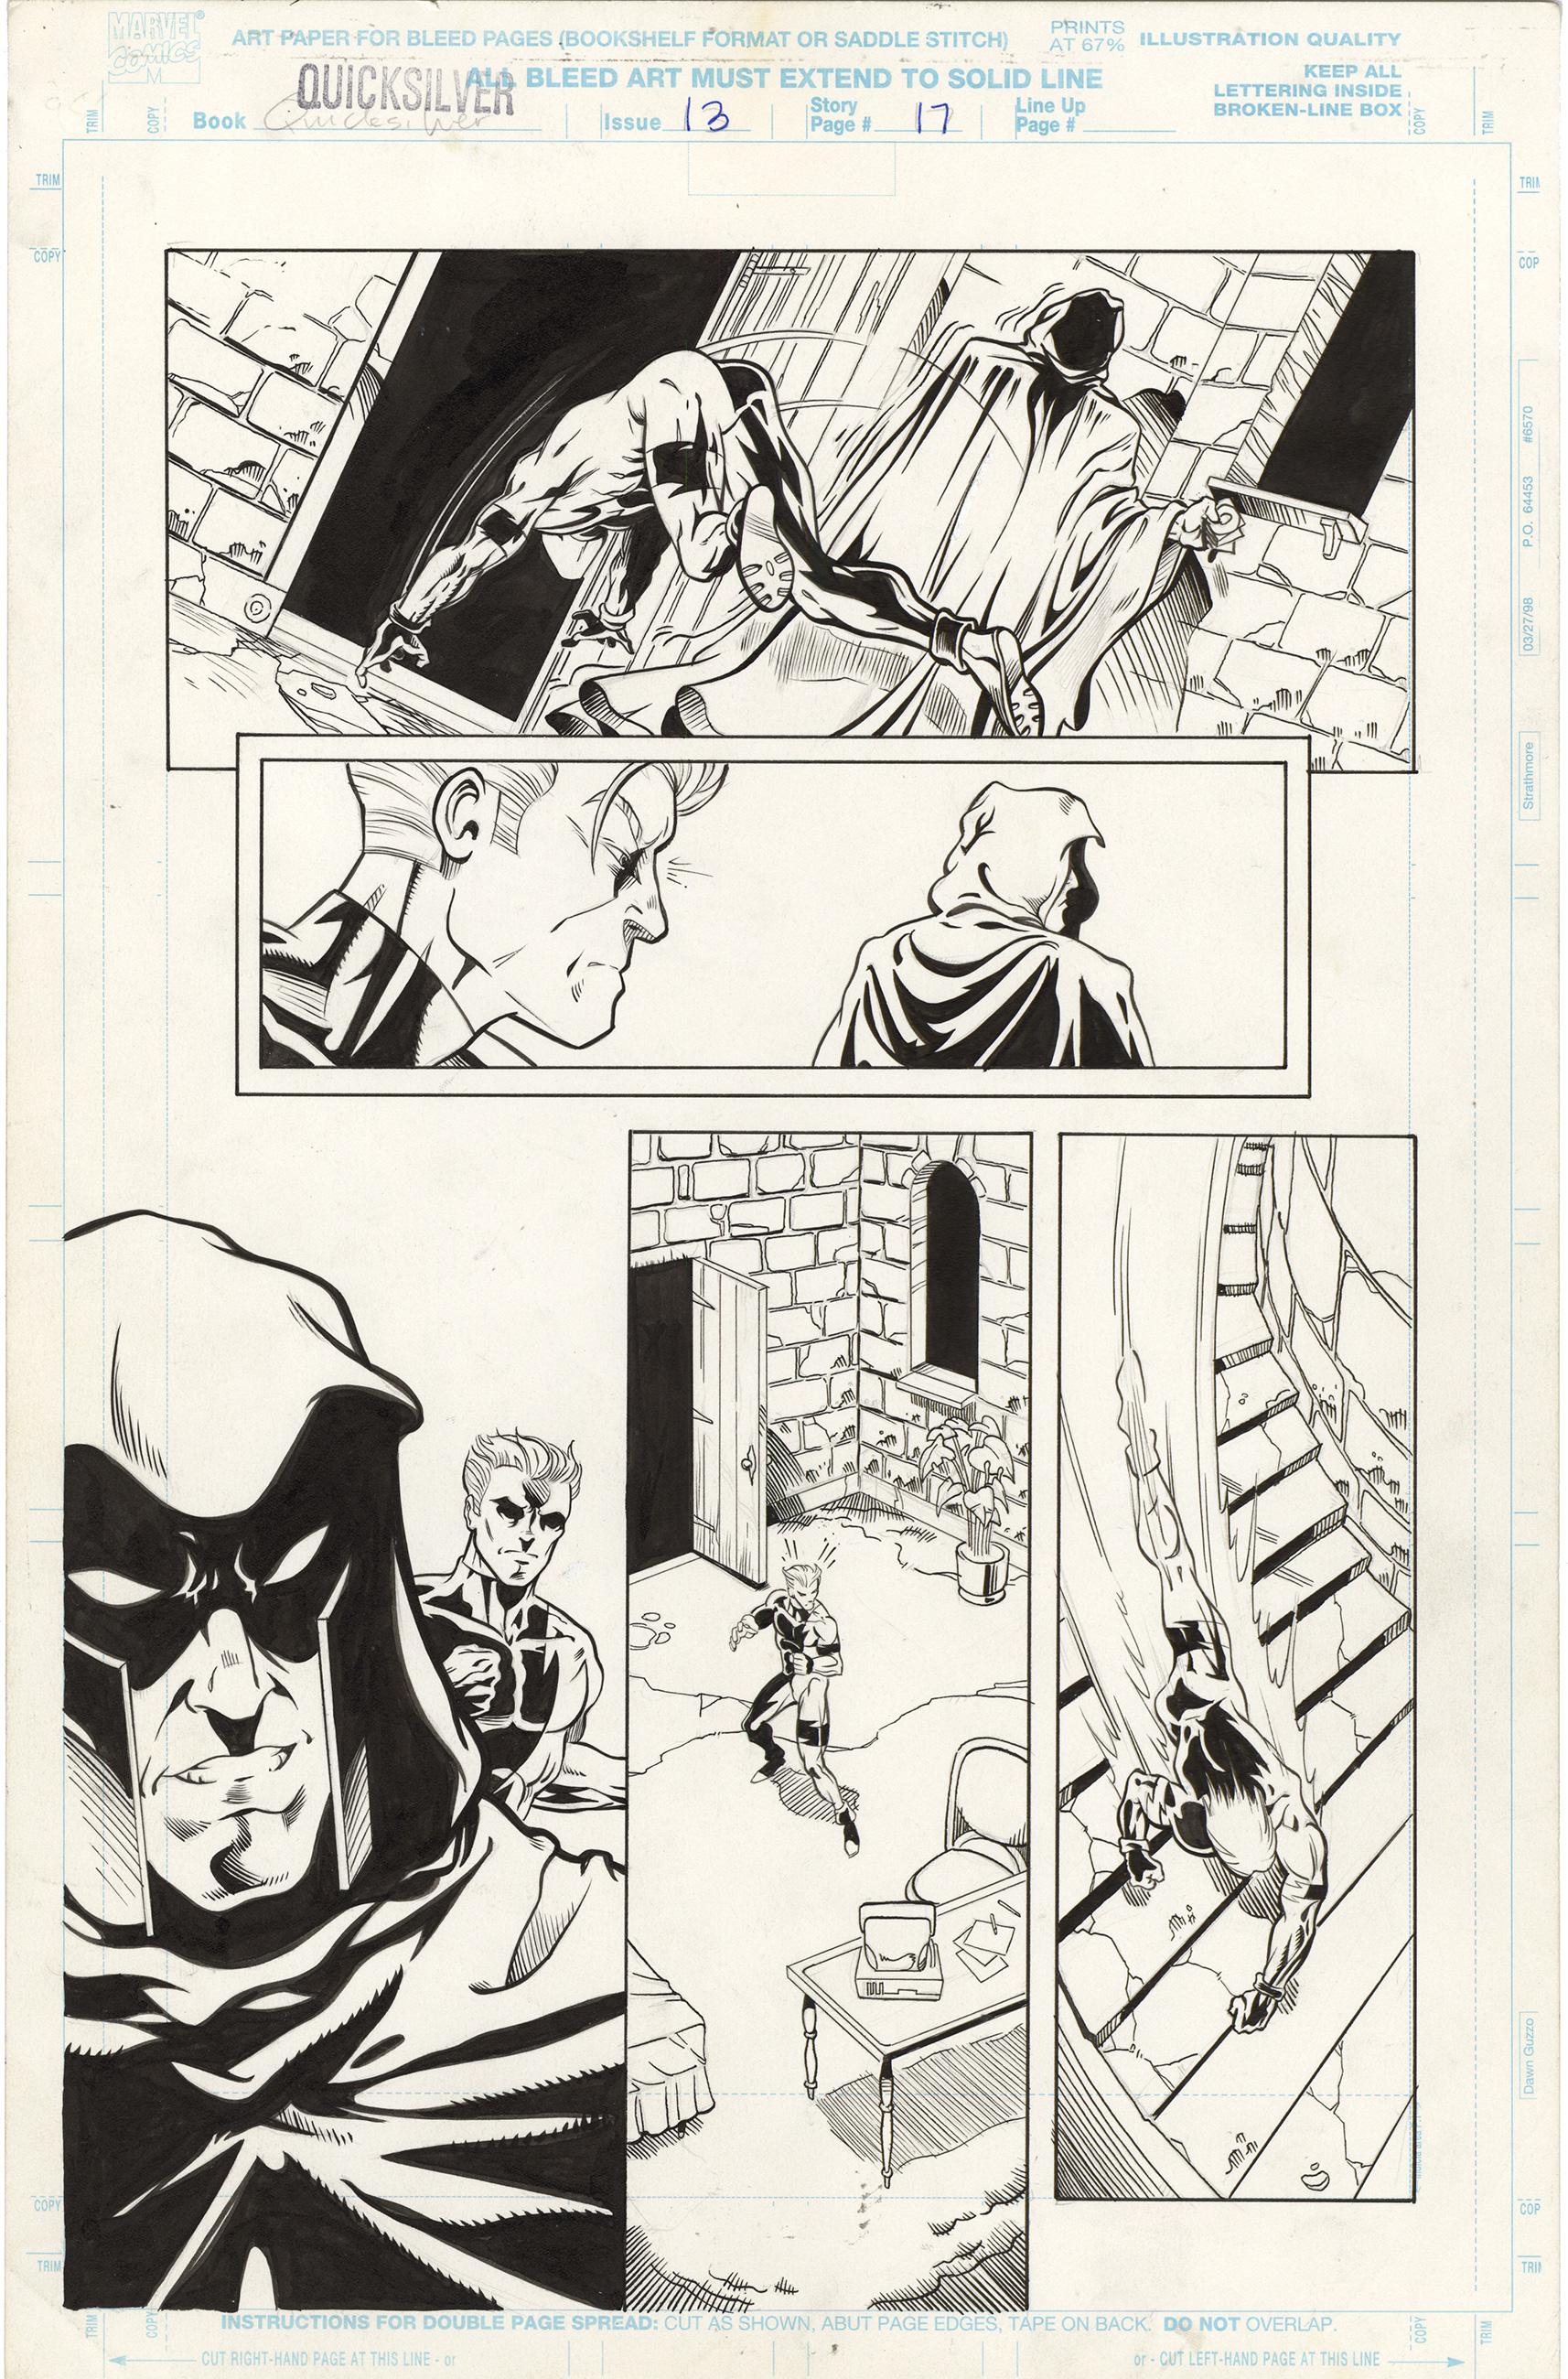 Quicksilver #13 p17